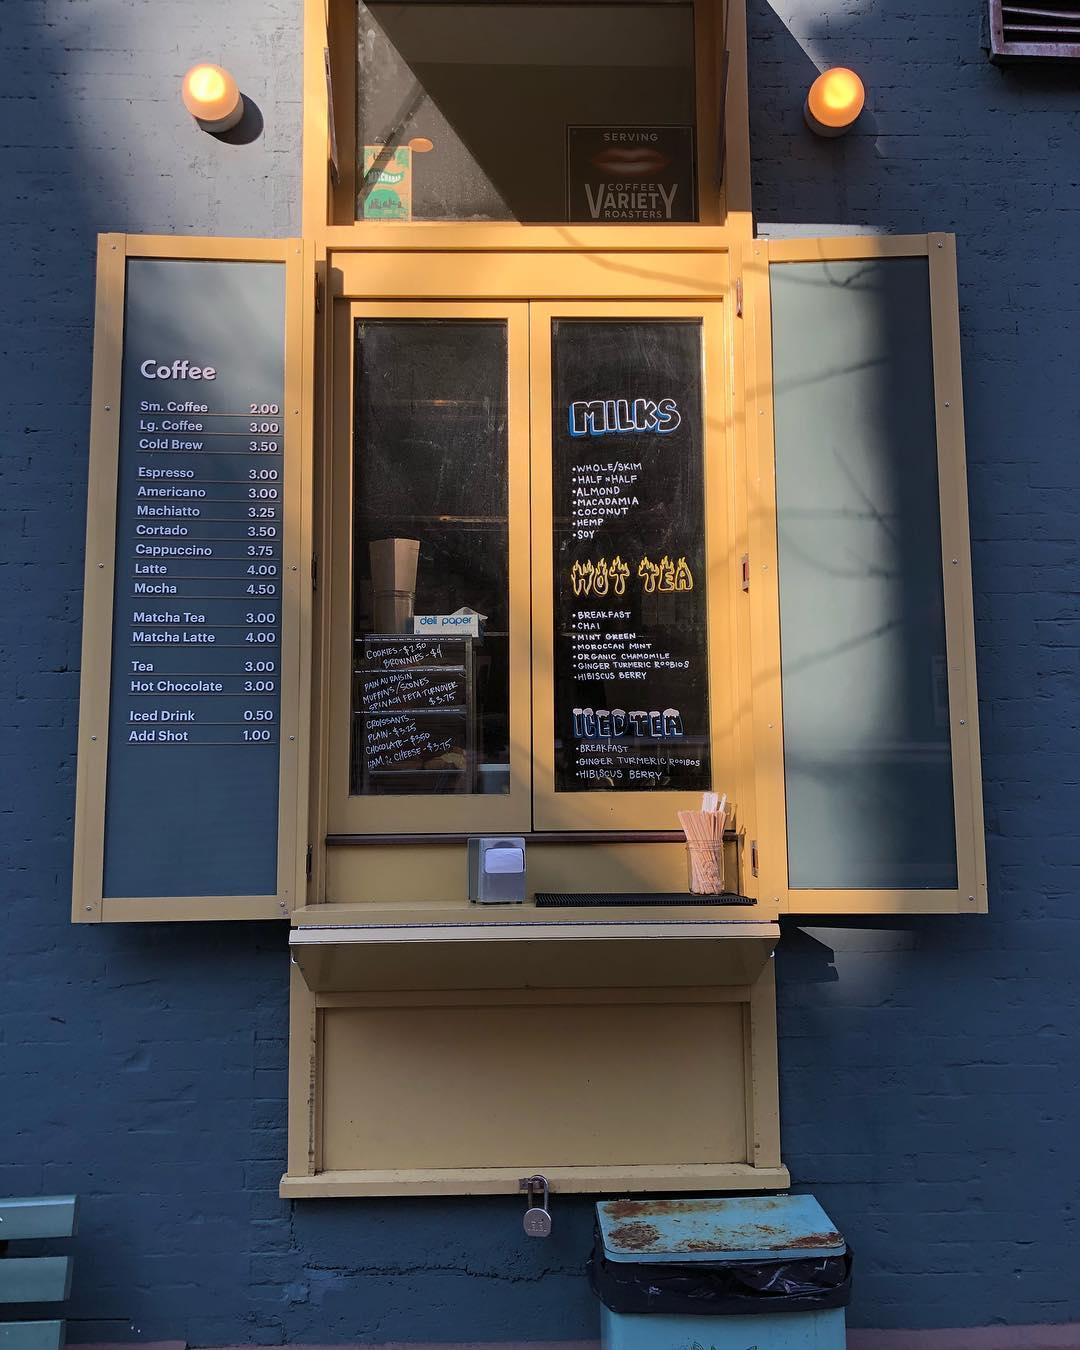 CBD 4/20 Edibles NYC